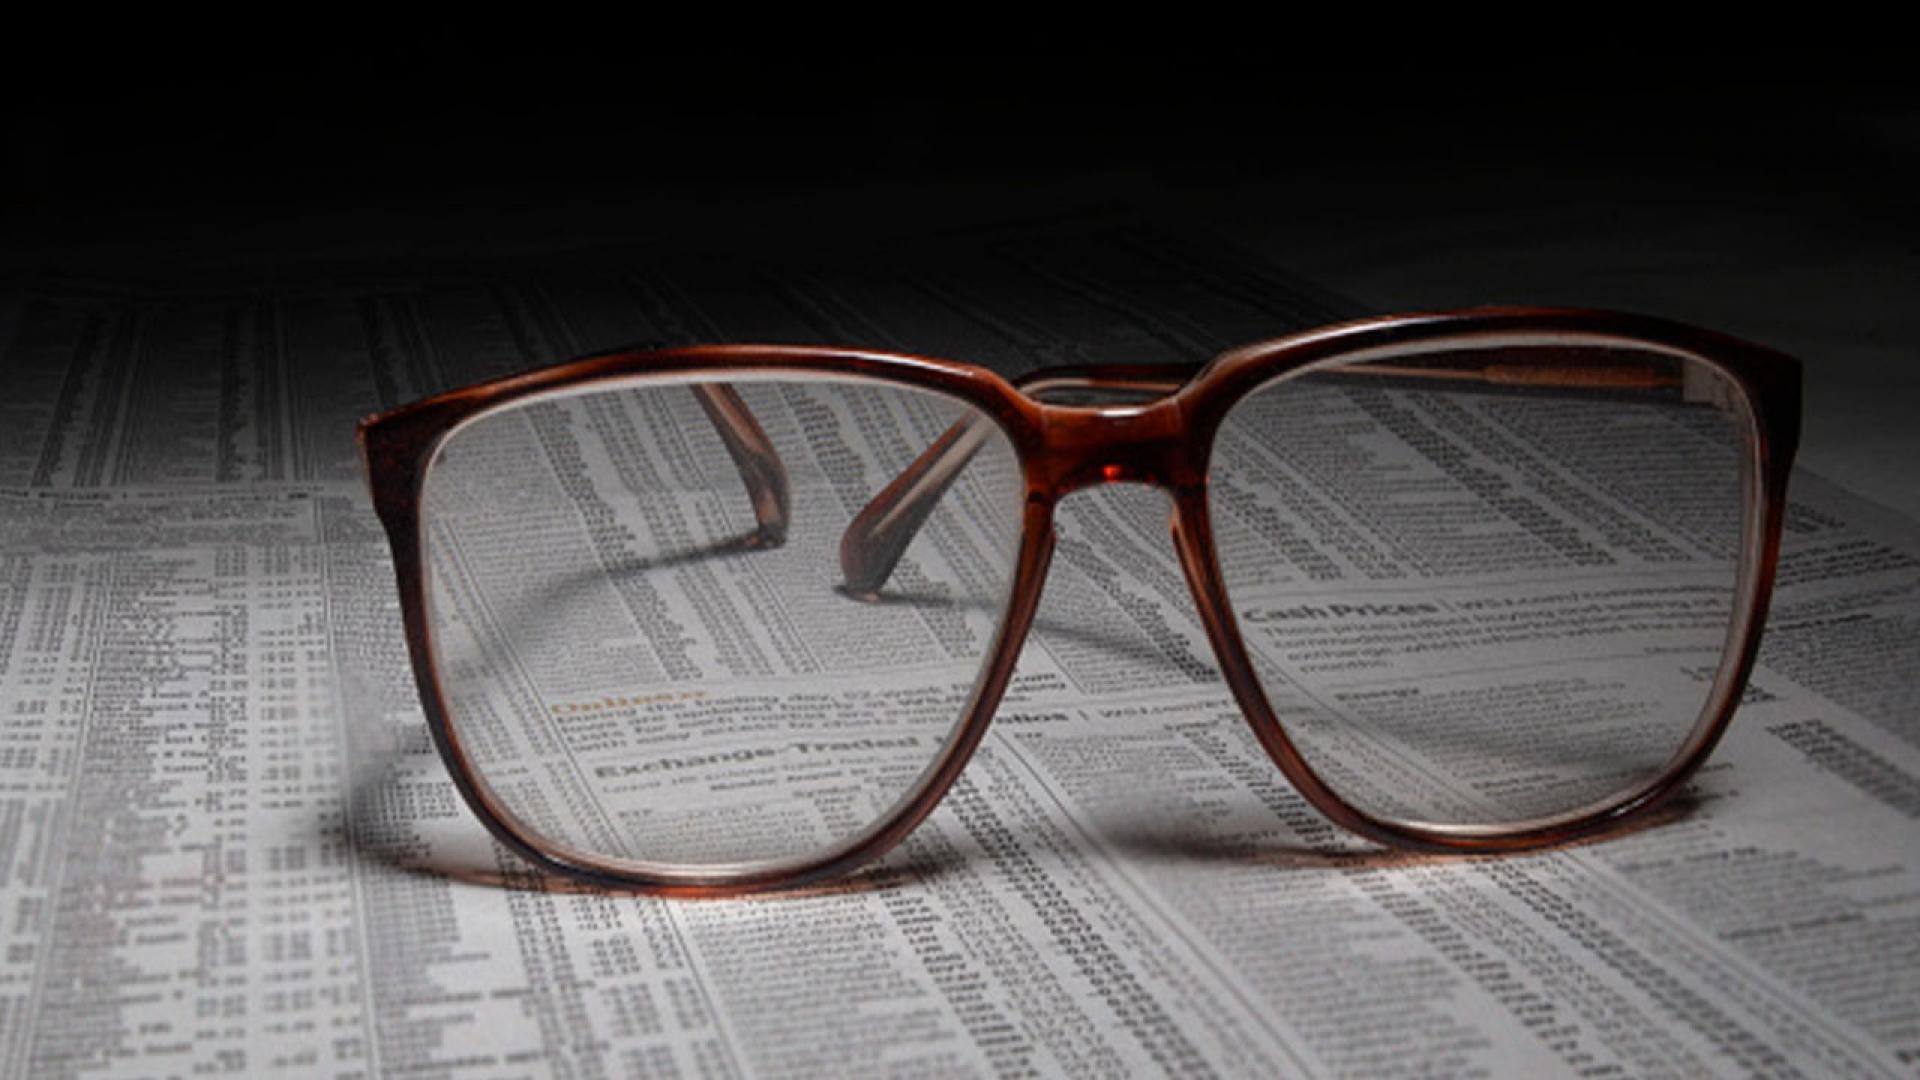 Stock image of eyeglasses